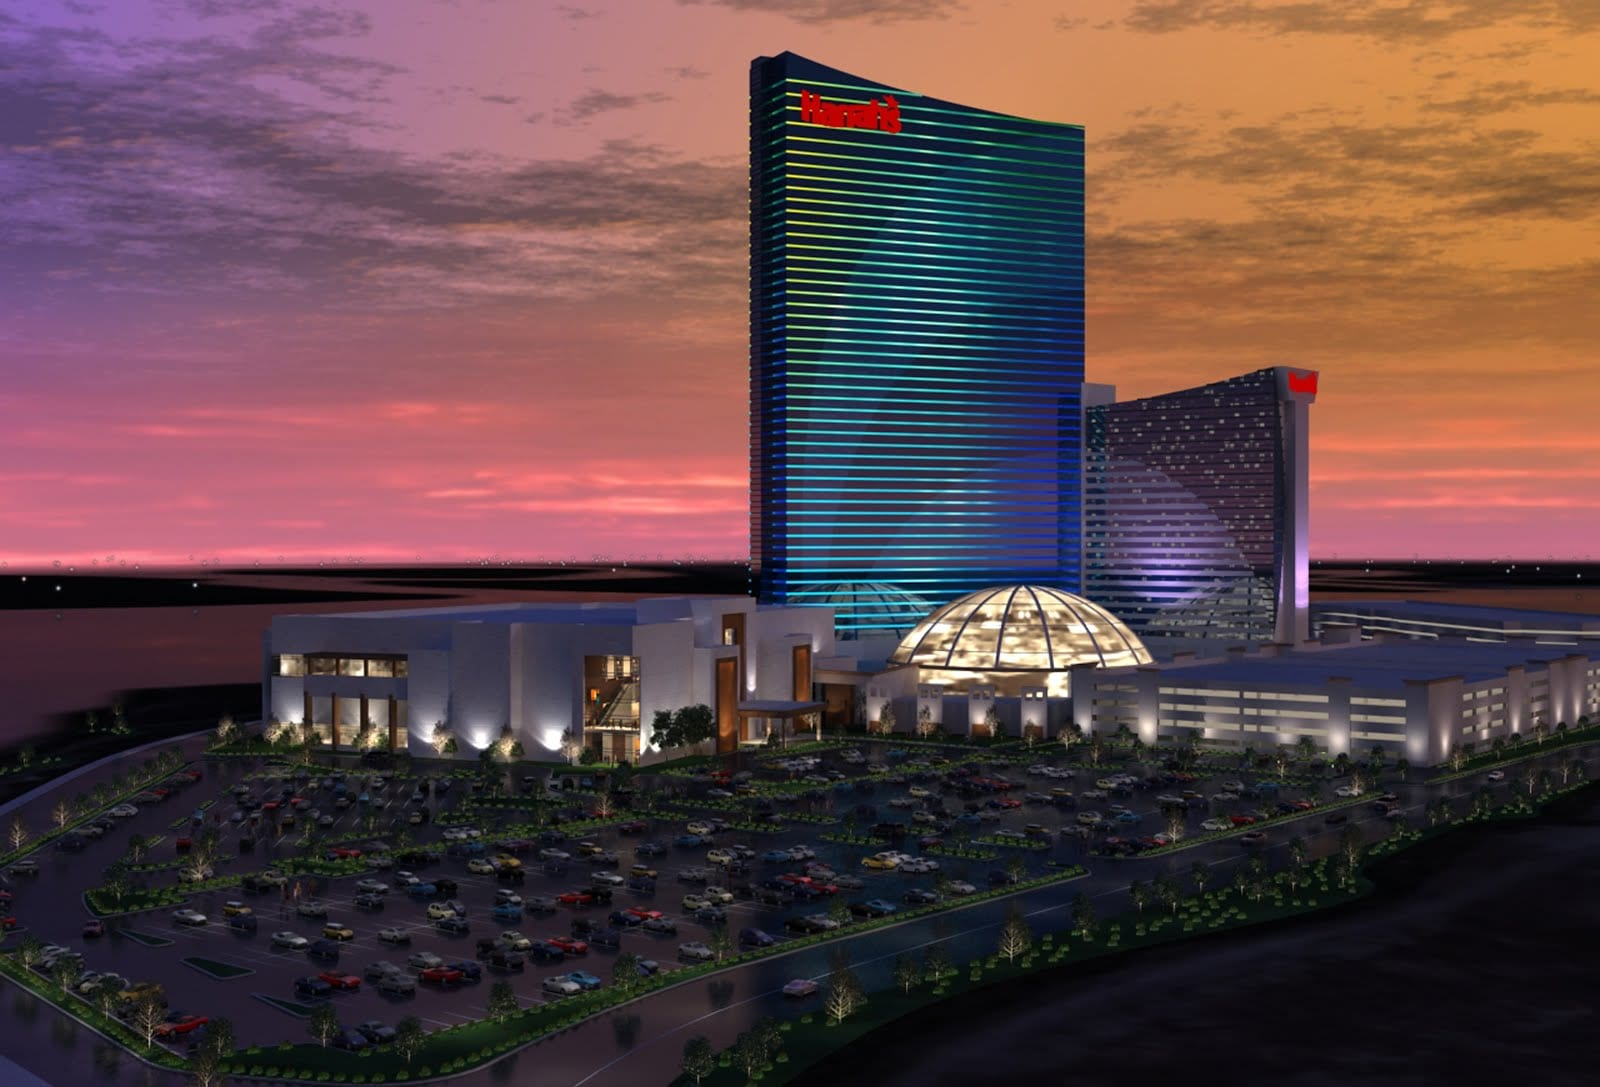 NJ Casino Trips - Harrah's Resort - LI Casino Transportation